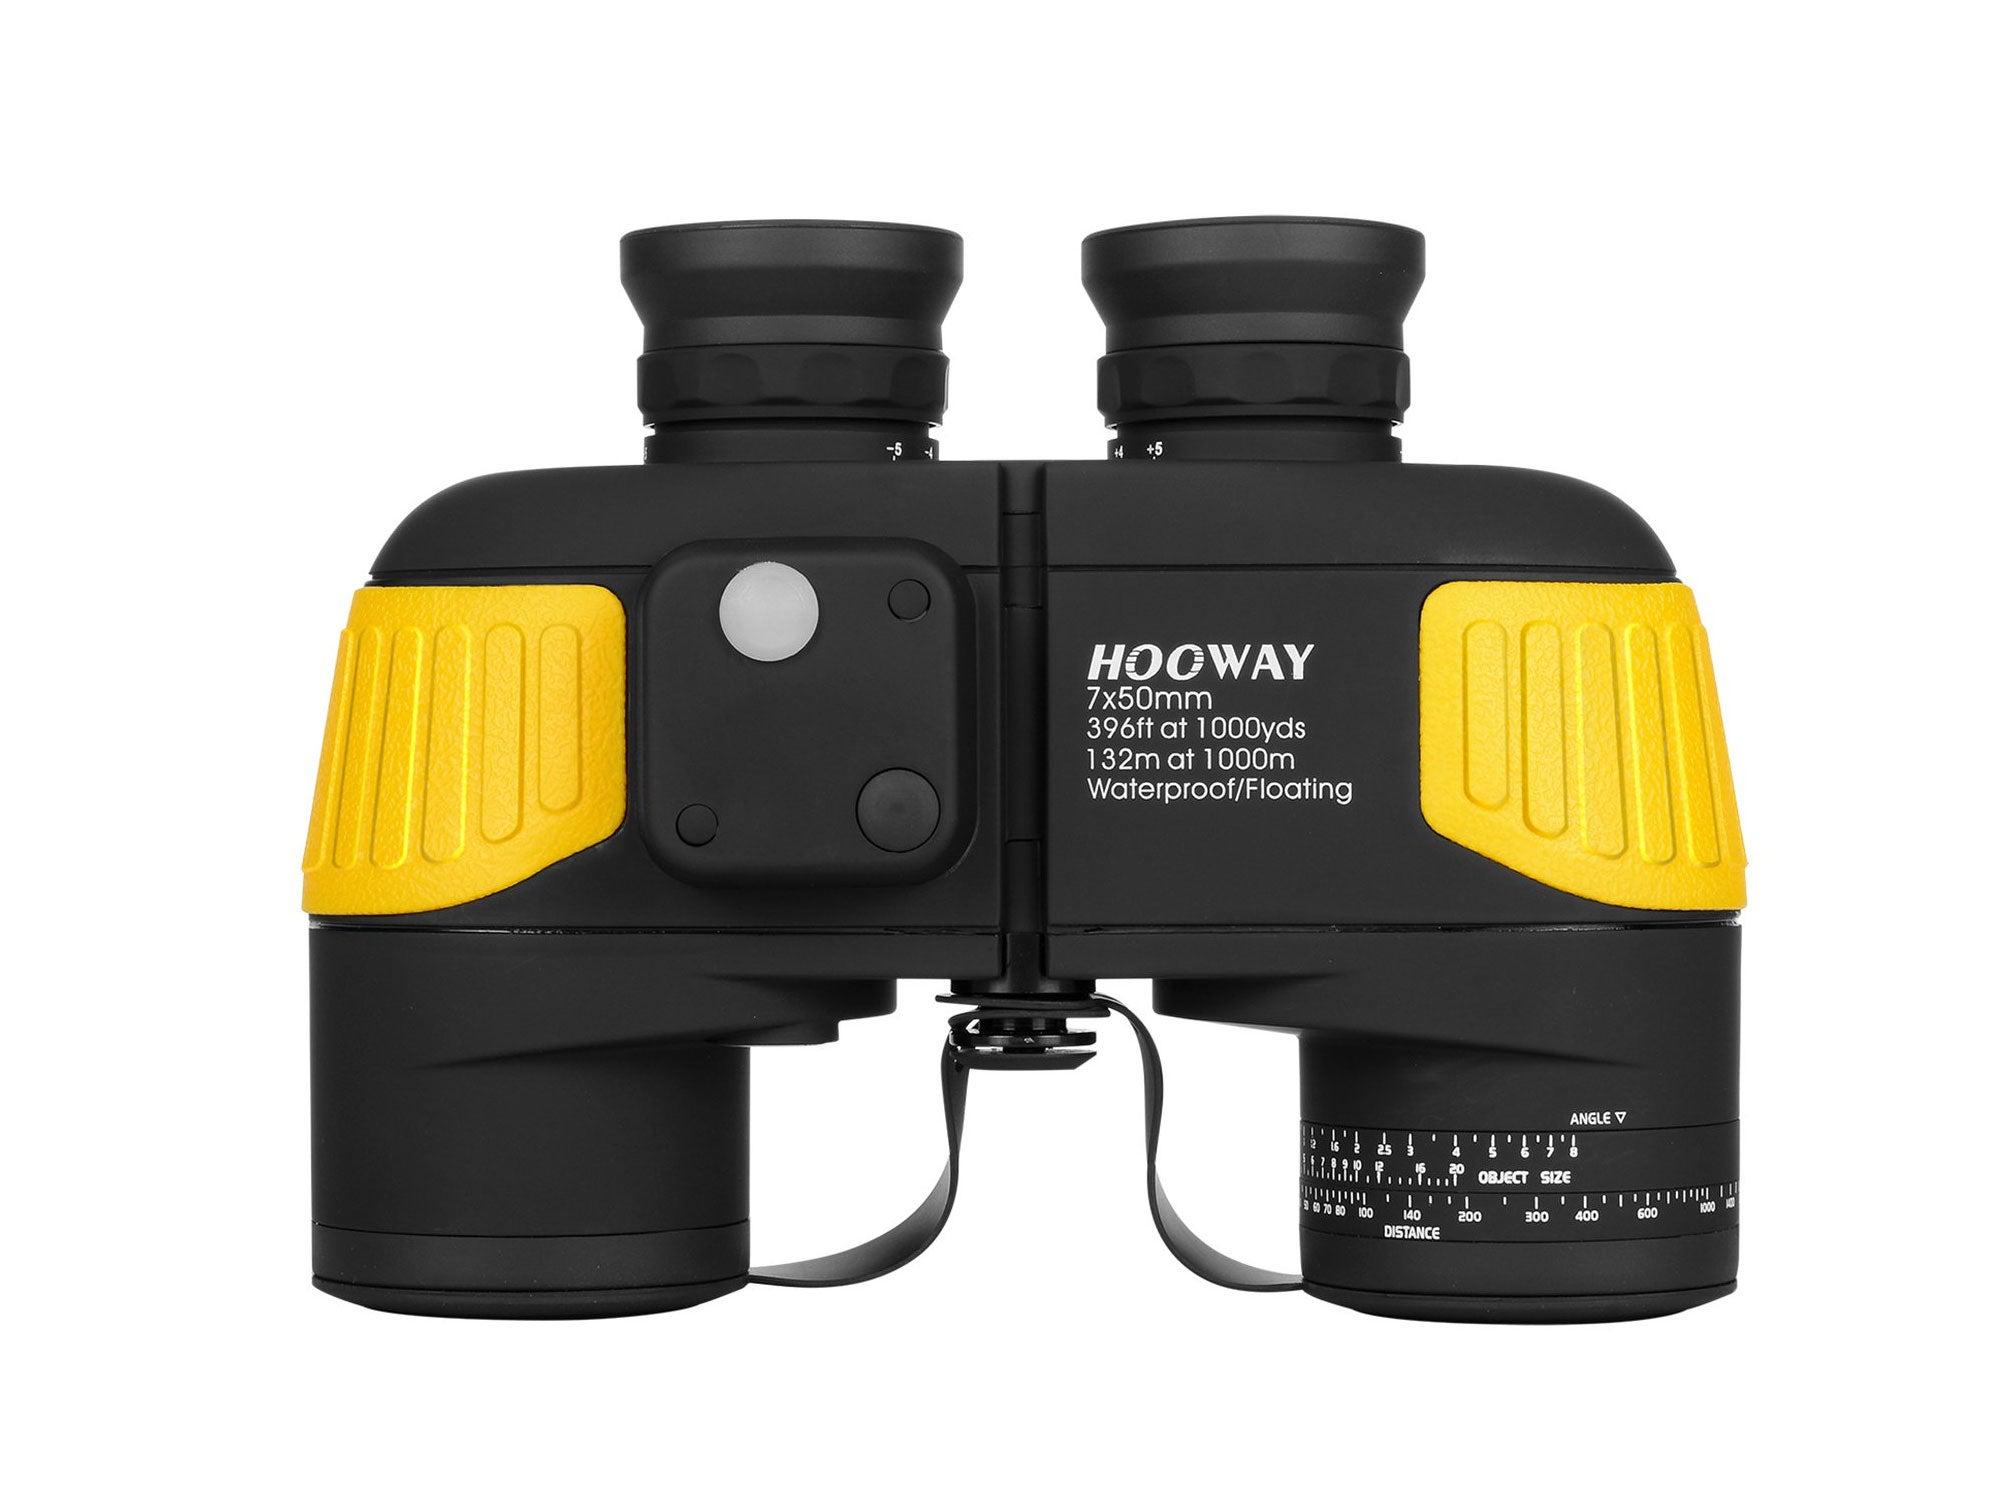 Hooway Waterproof Fogproof Military Marine Binoculars